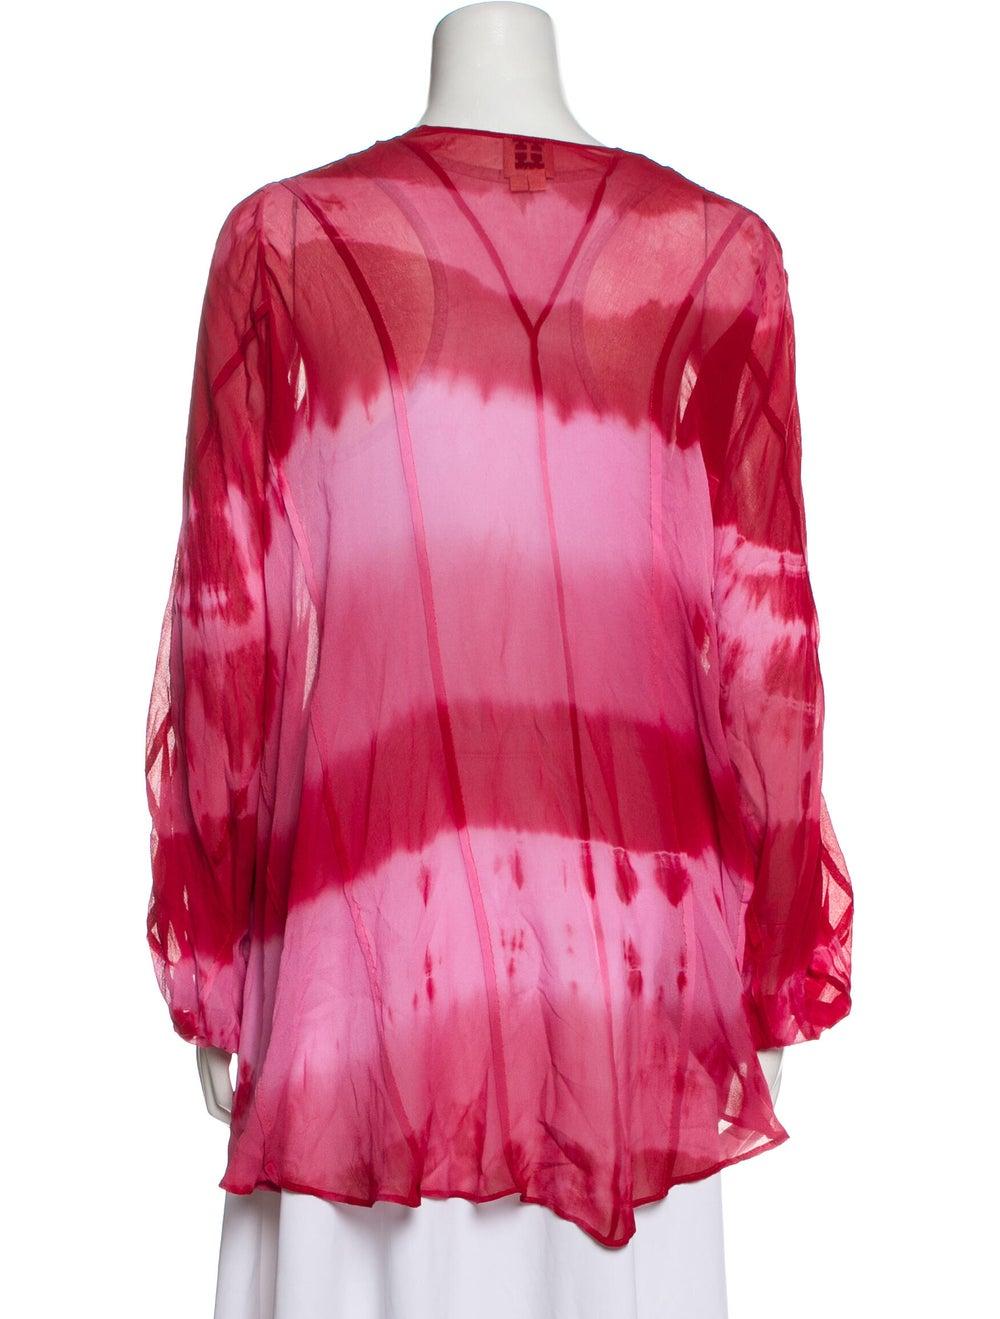 Haute Hippie Silk Tie-Dye Print Sweater Red - image 3